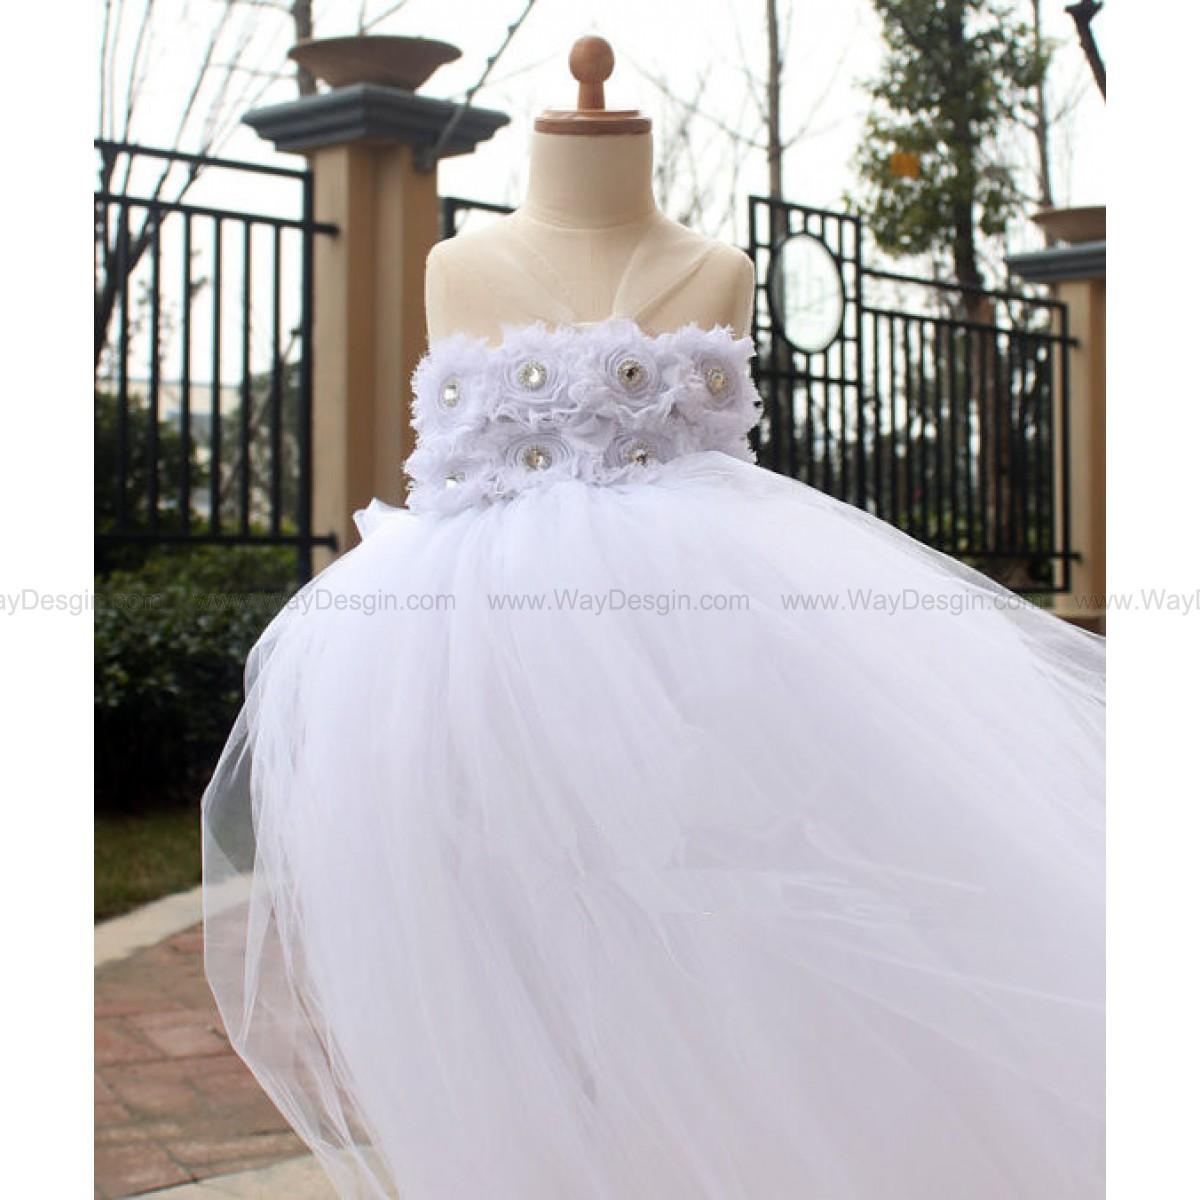 White Flower Girl Tutu Dress baby dress toddler birthday dress wedding tutu dress